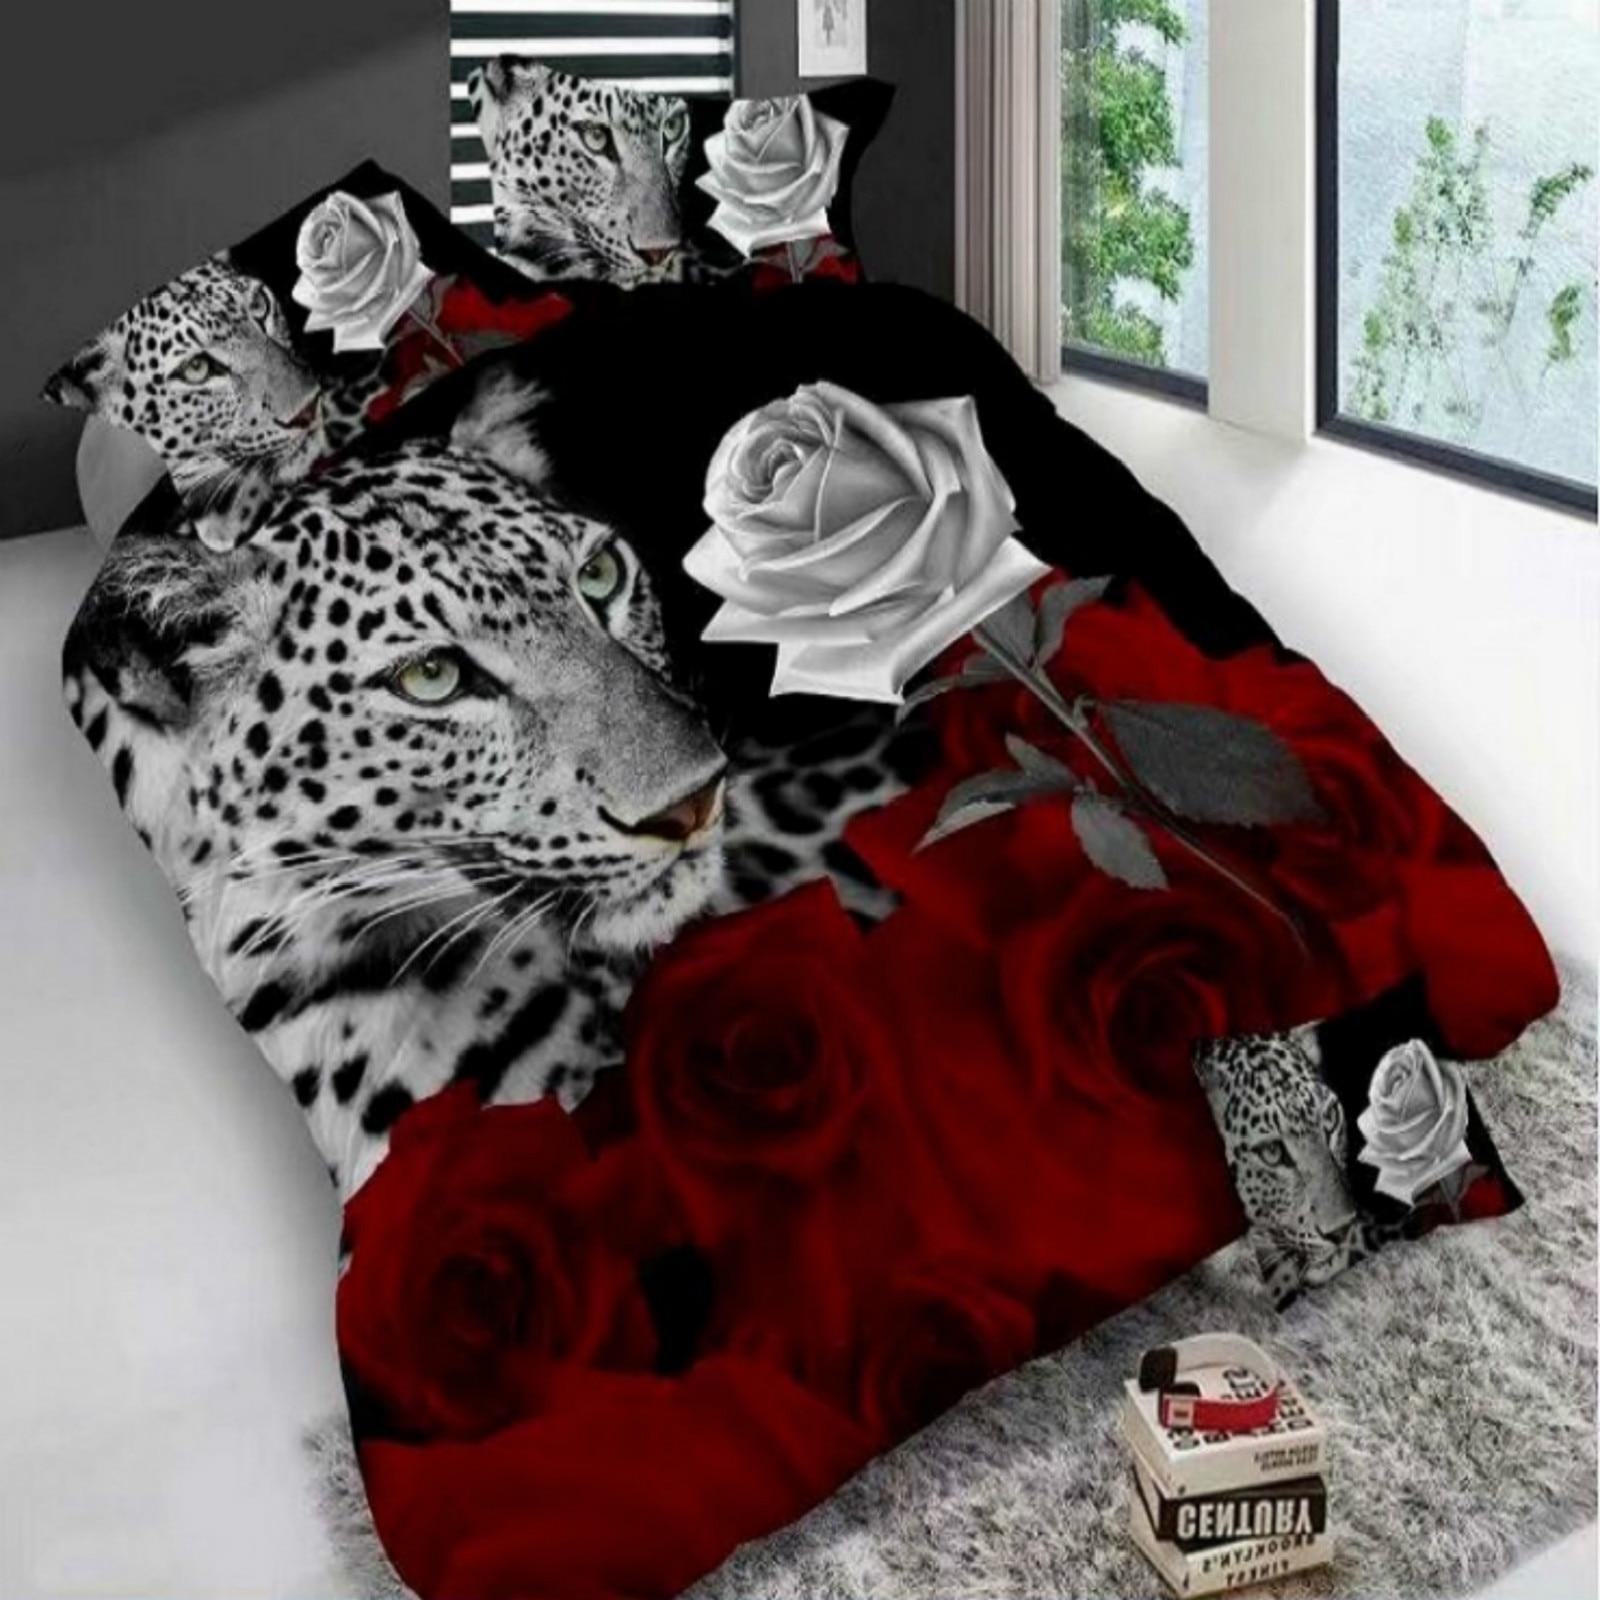 Animal 3D Bedding Set Luxury Soft Comfortable Sets Decor Cat Printed Duvet Pillowcase Polyester Bed Set Home Textiles